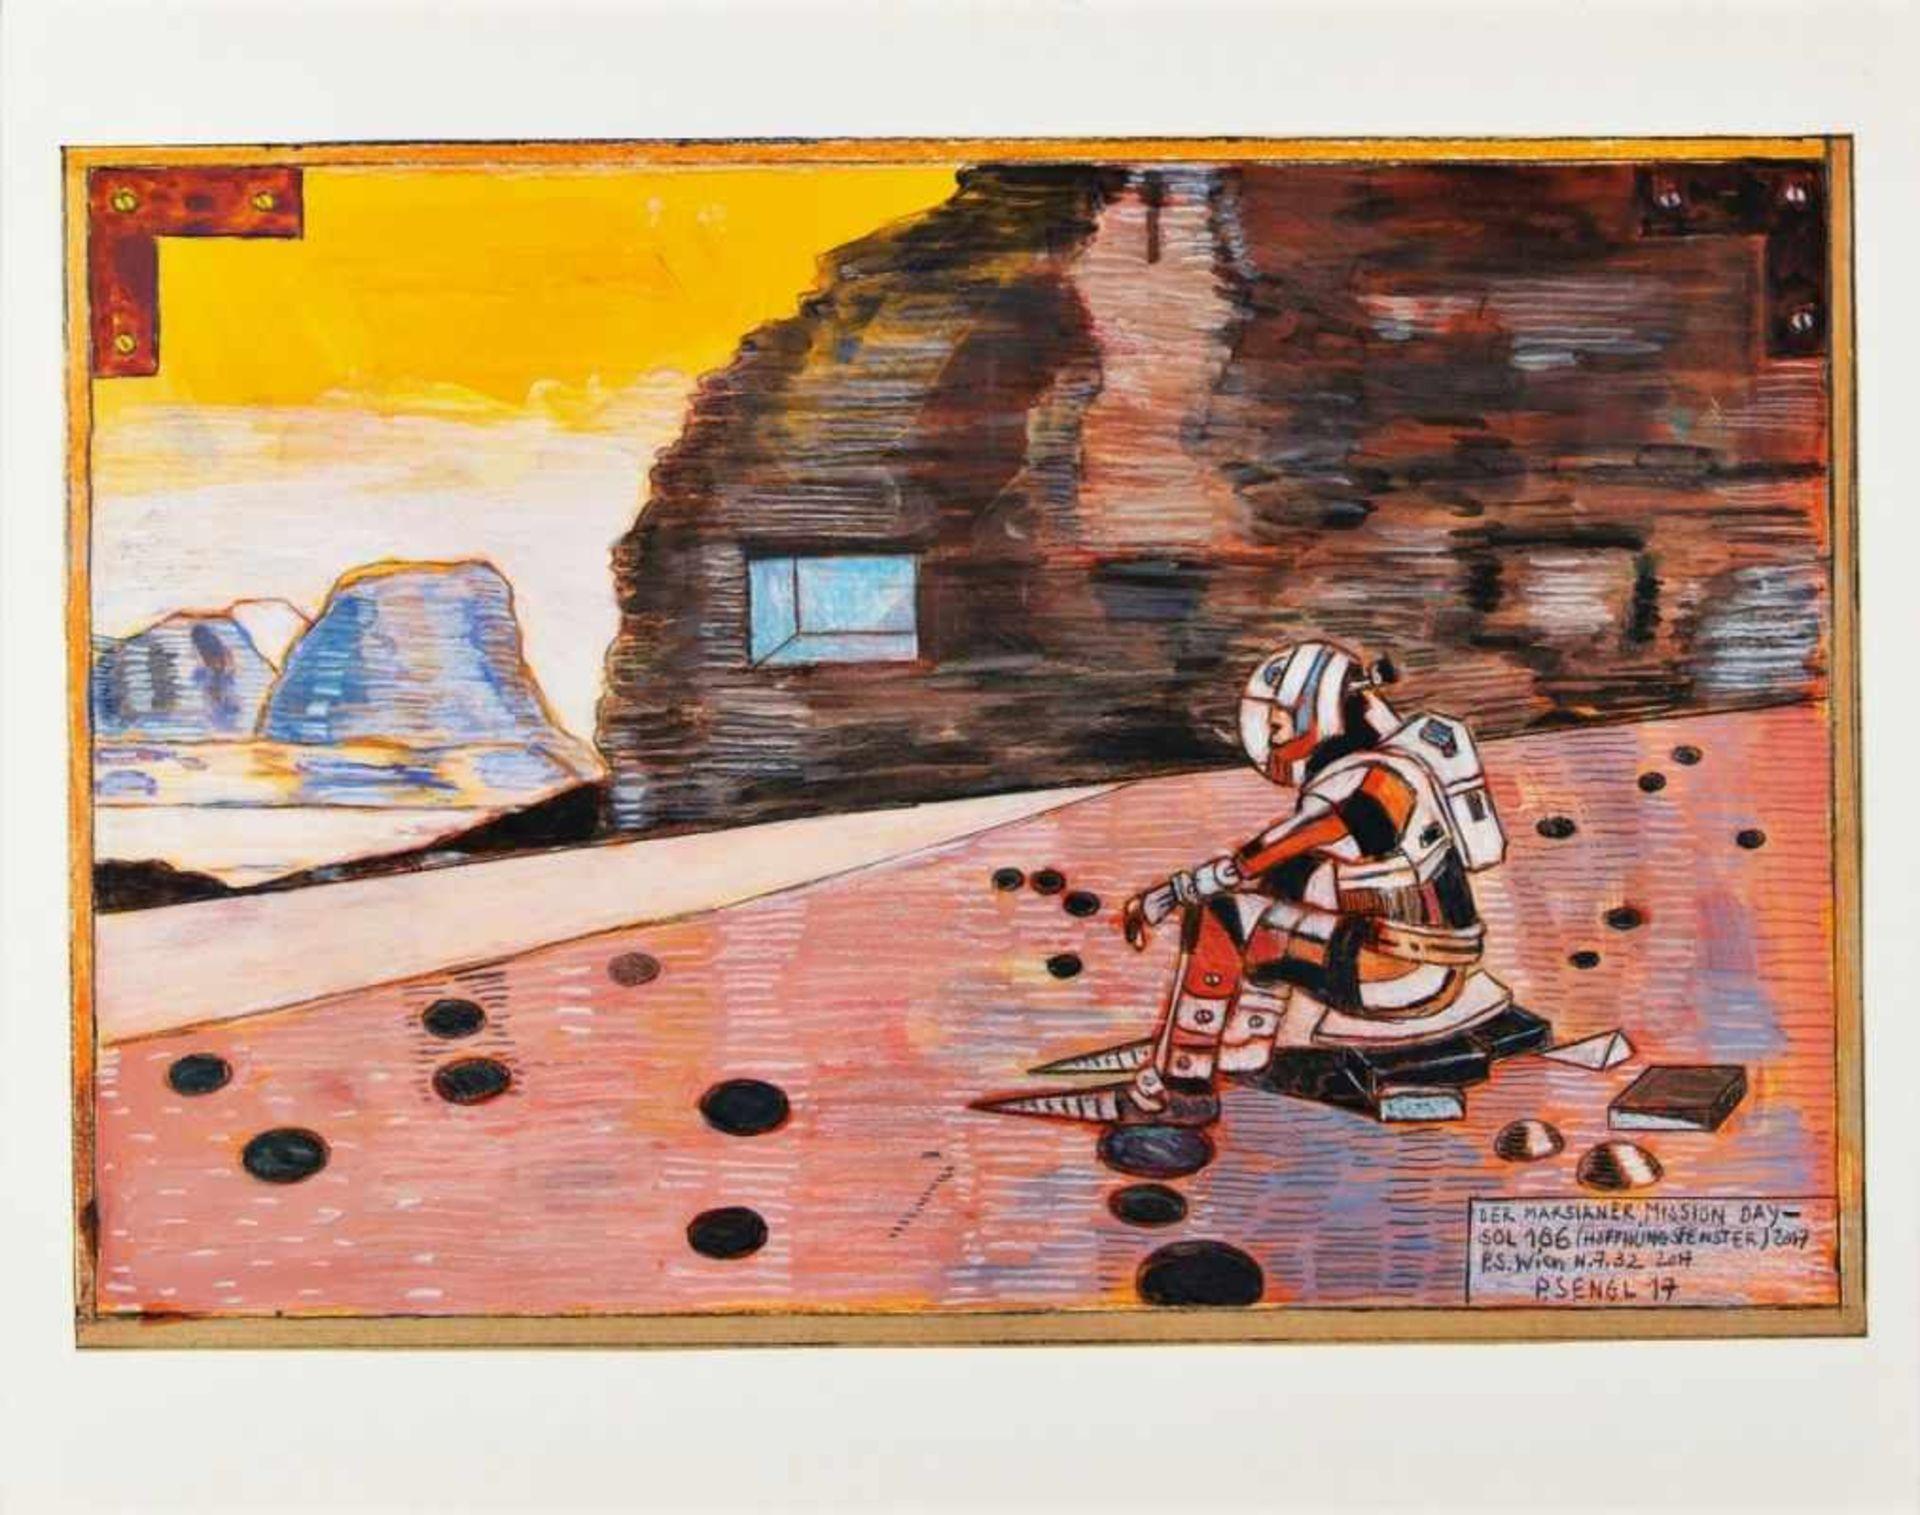 PETER SENGL(1945 UNTERBERGLA)DER MARSIANER, 2017Mischtechnik auf Papier, 31 x 45 cmgerahmt, Maß